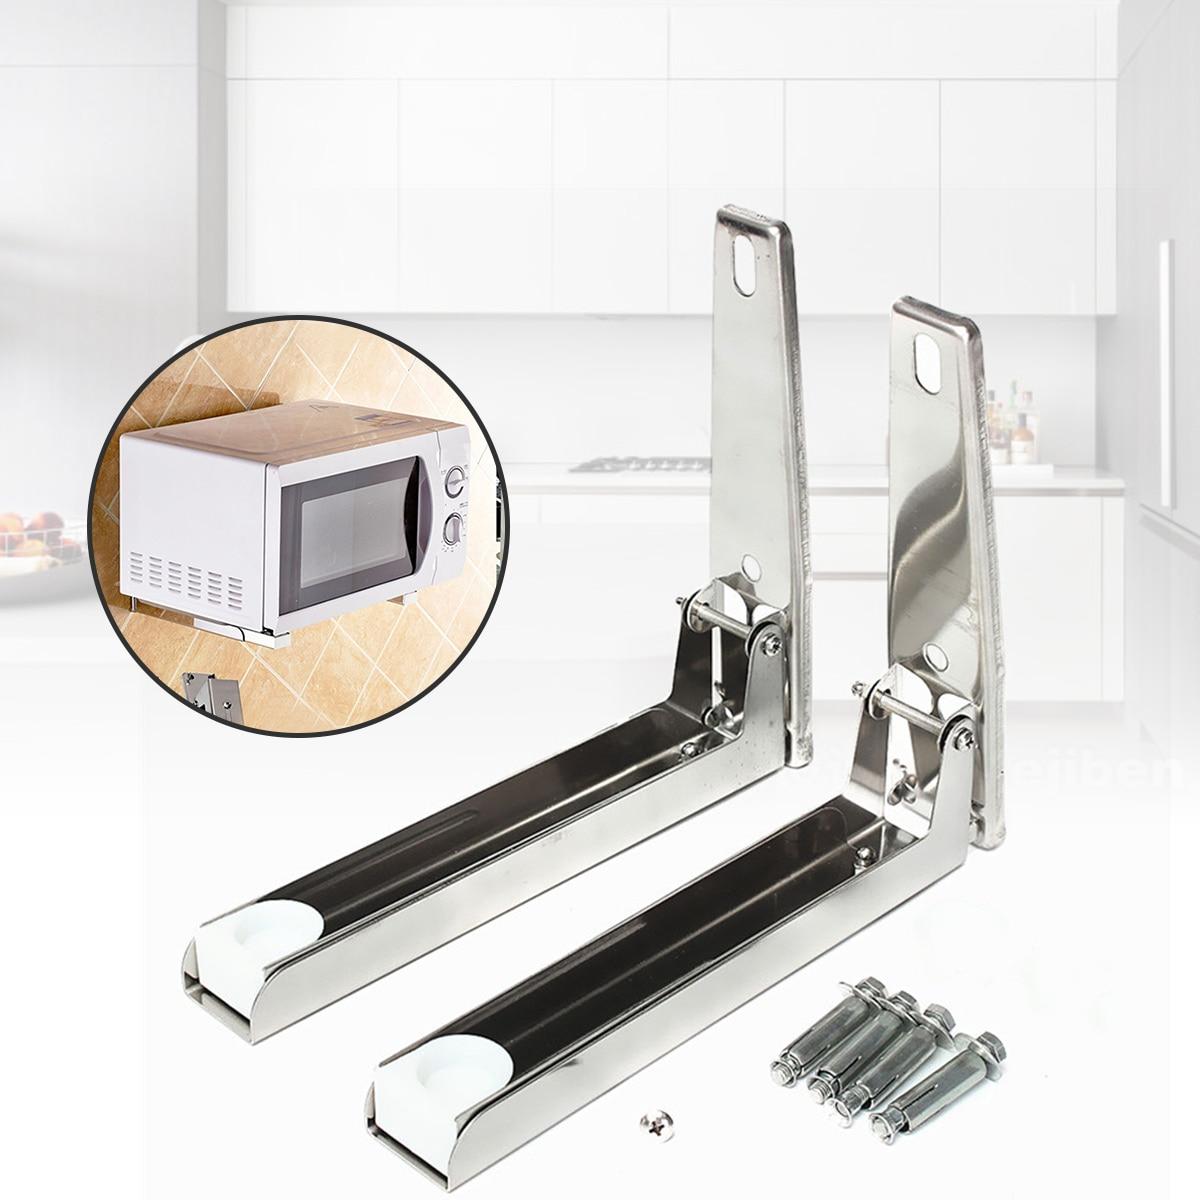 Stainless Steel Microwave Foldable Oven Shelf Rack Support Frame Stretch Adjustable Wall Mount Bracket Holder Kitchen Storage стоимость